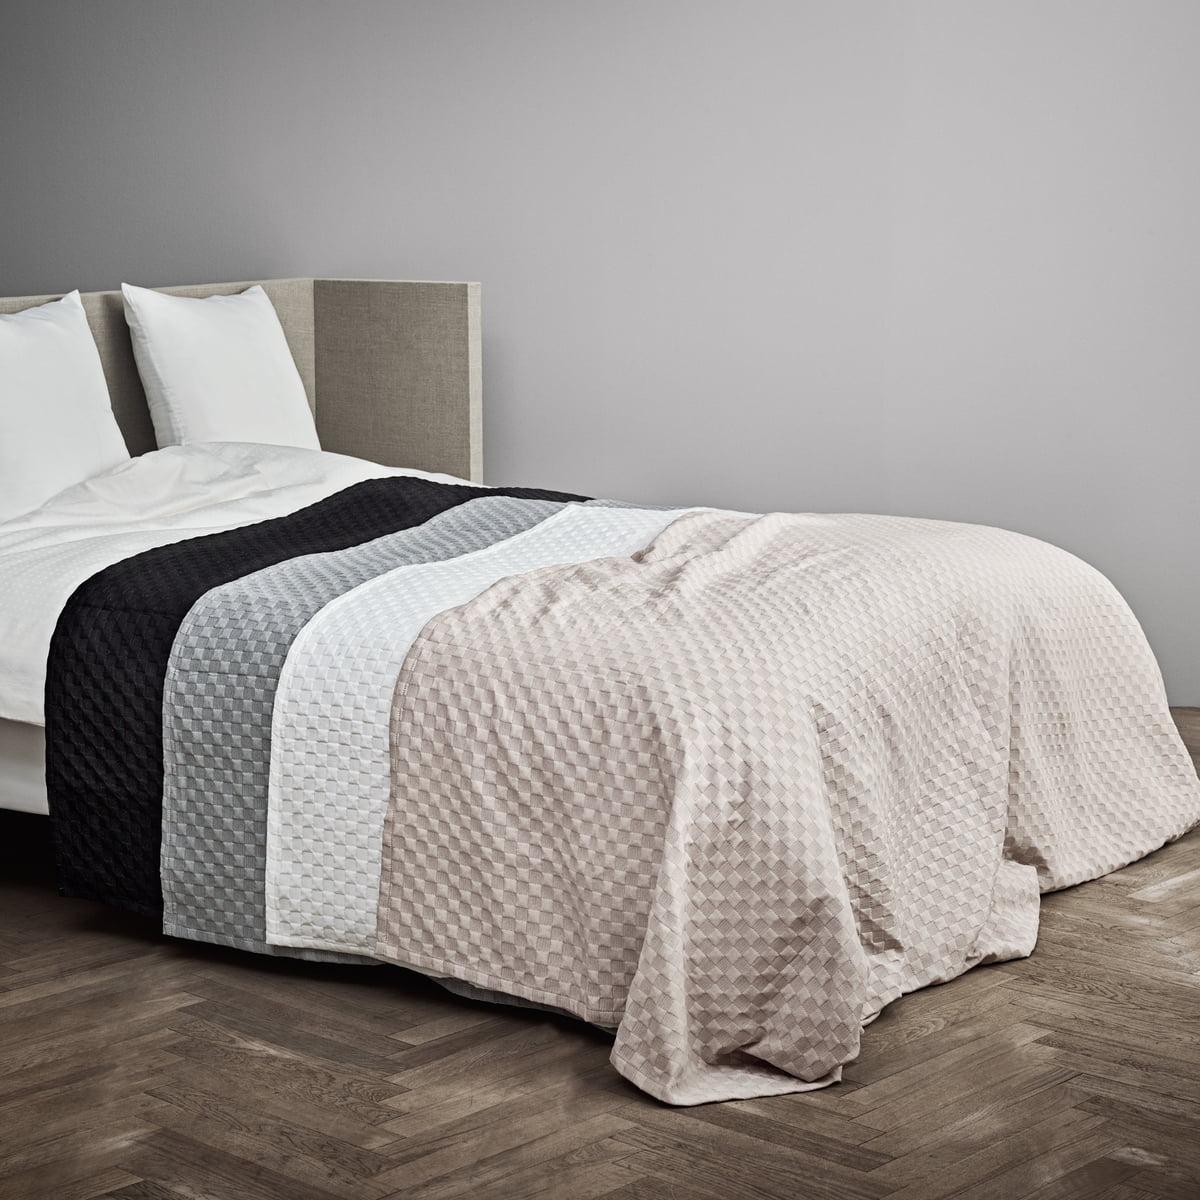 caro bedspread by juna connox shop. Black Bedroom Furniture Sets. Home Design Ideas